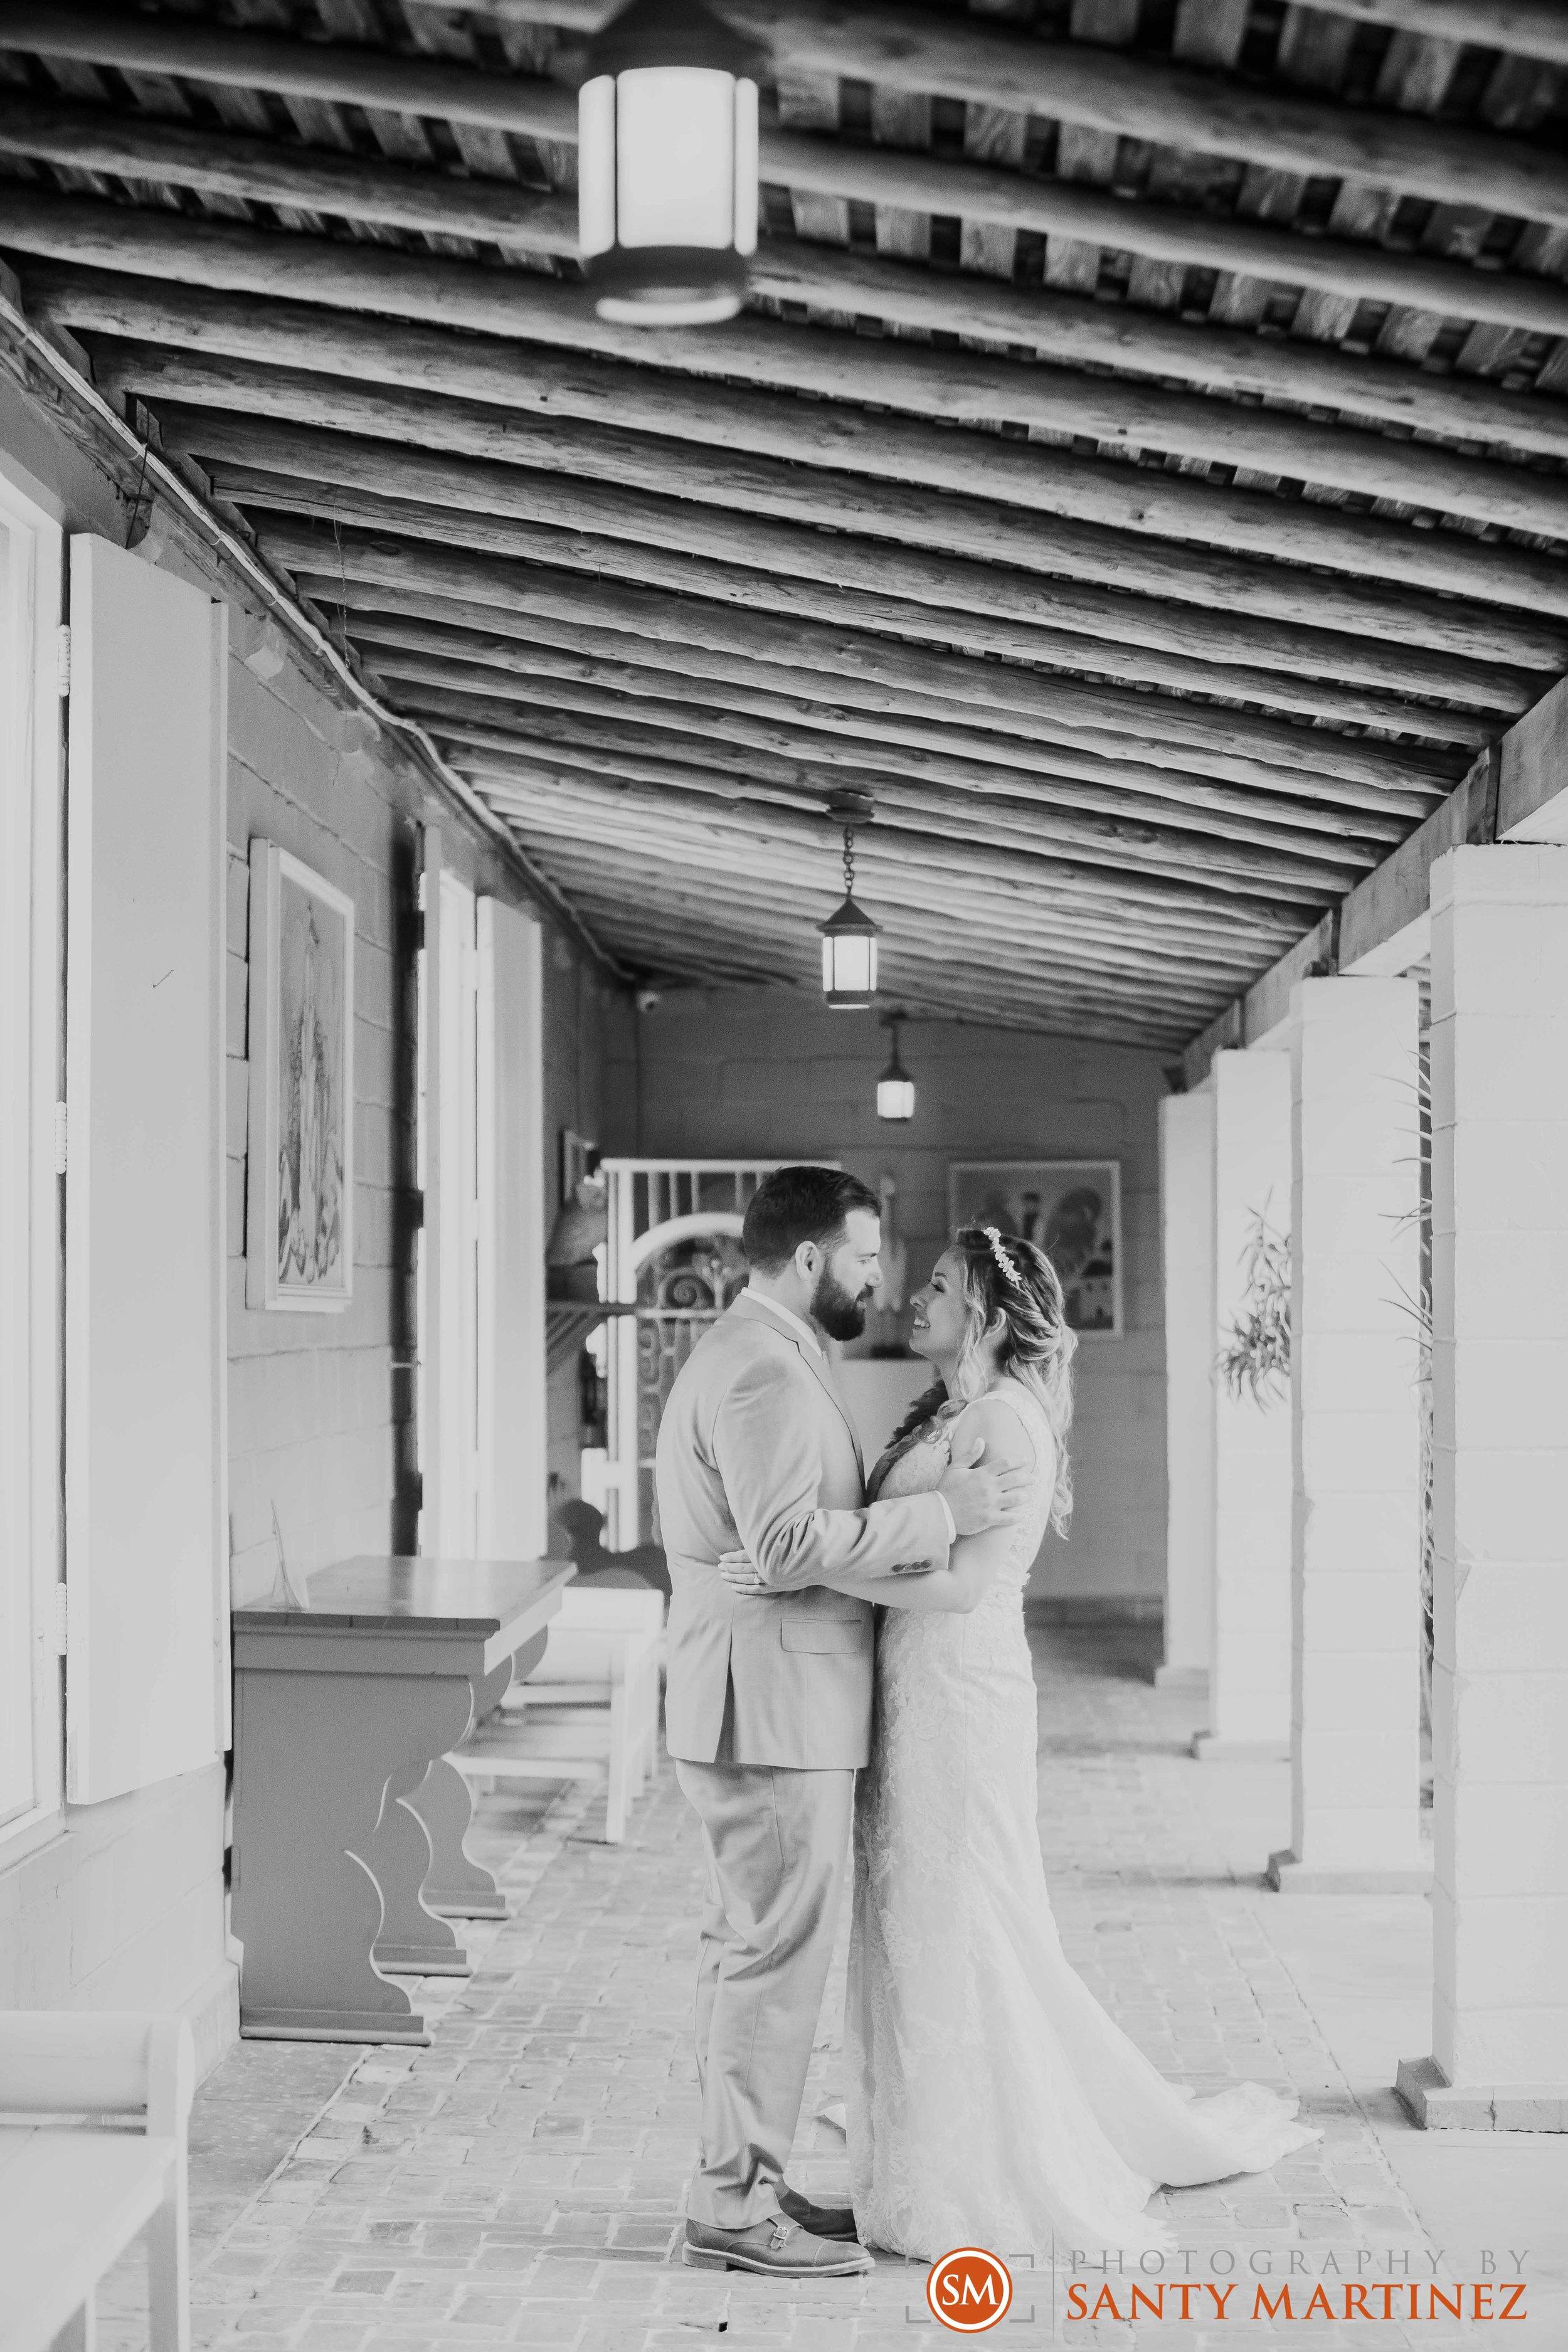 Wedding Bonnet House - Santy Martinez Photography-17.jpg